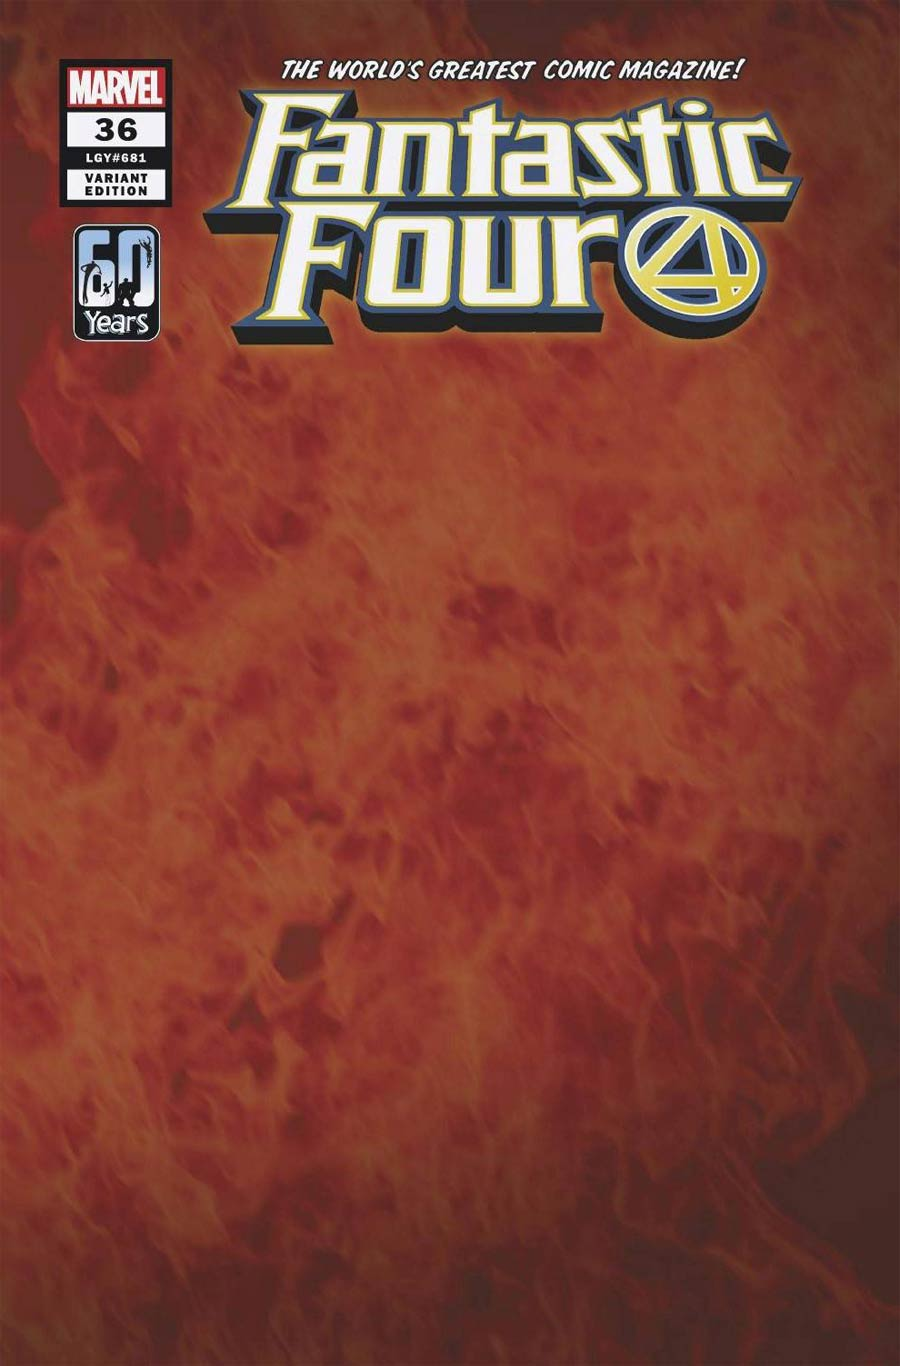 Fantastic Four Vol 6 #36 Cover C Variant Flame Wraparound Cover